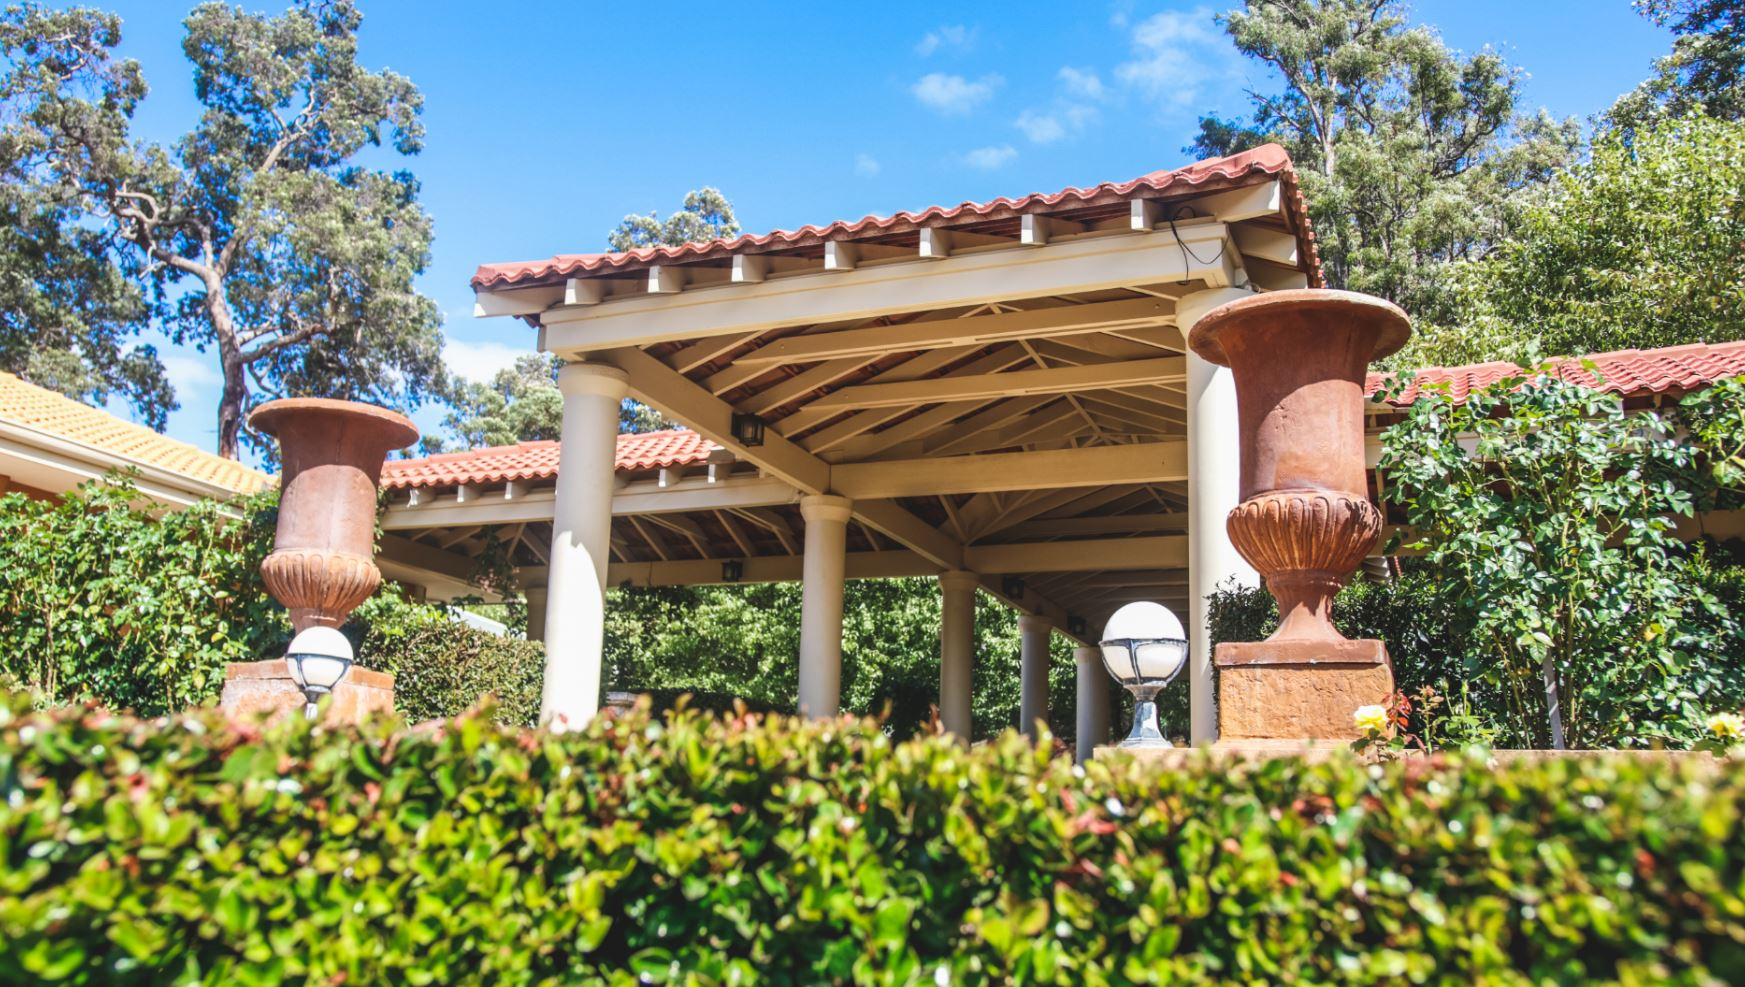 French Gardens - Masonmill Gardens